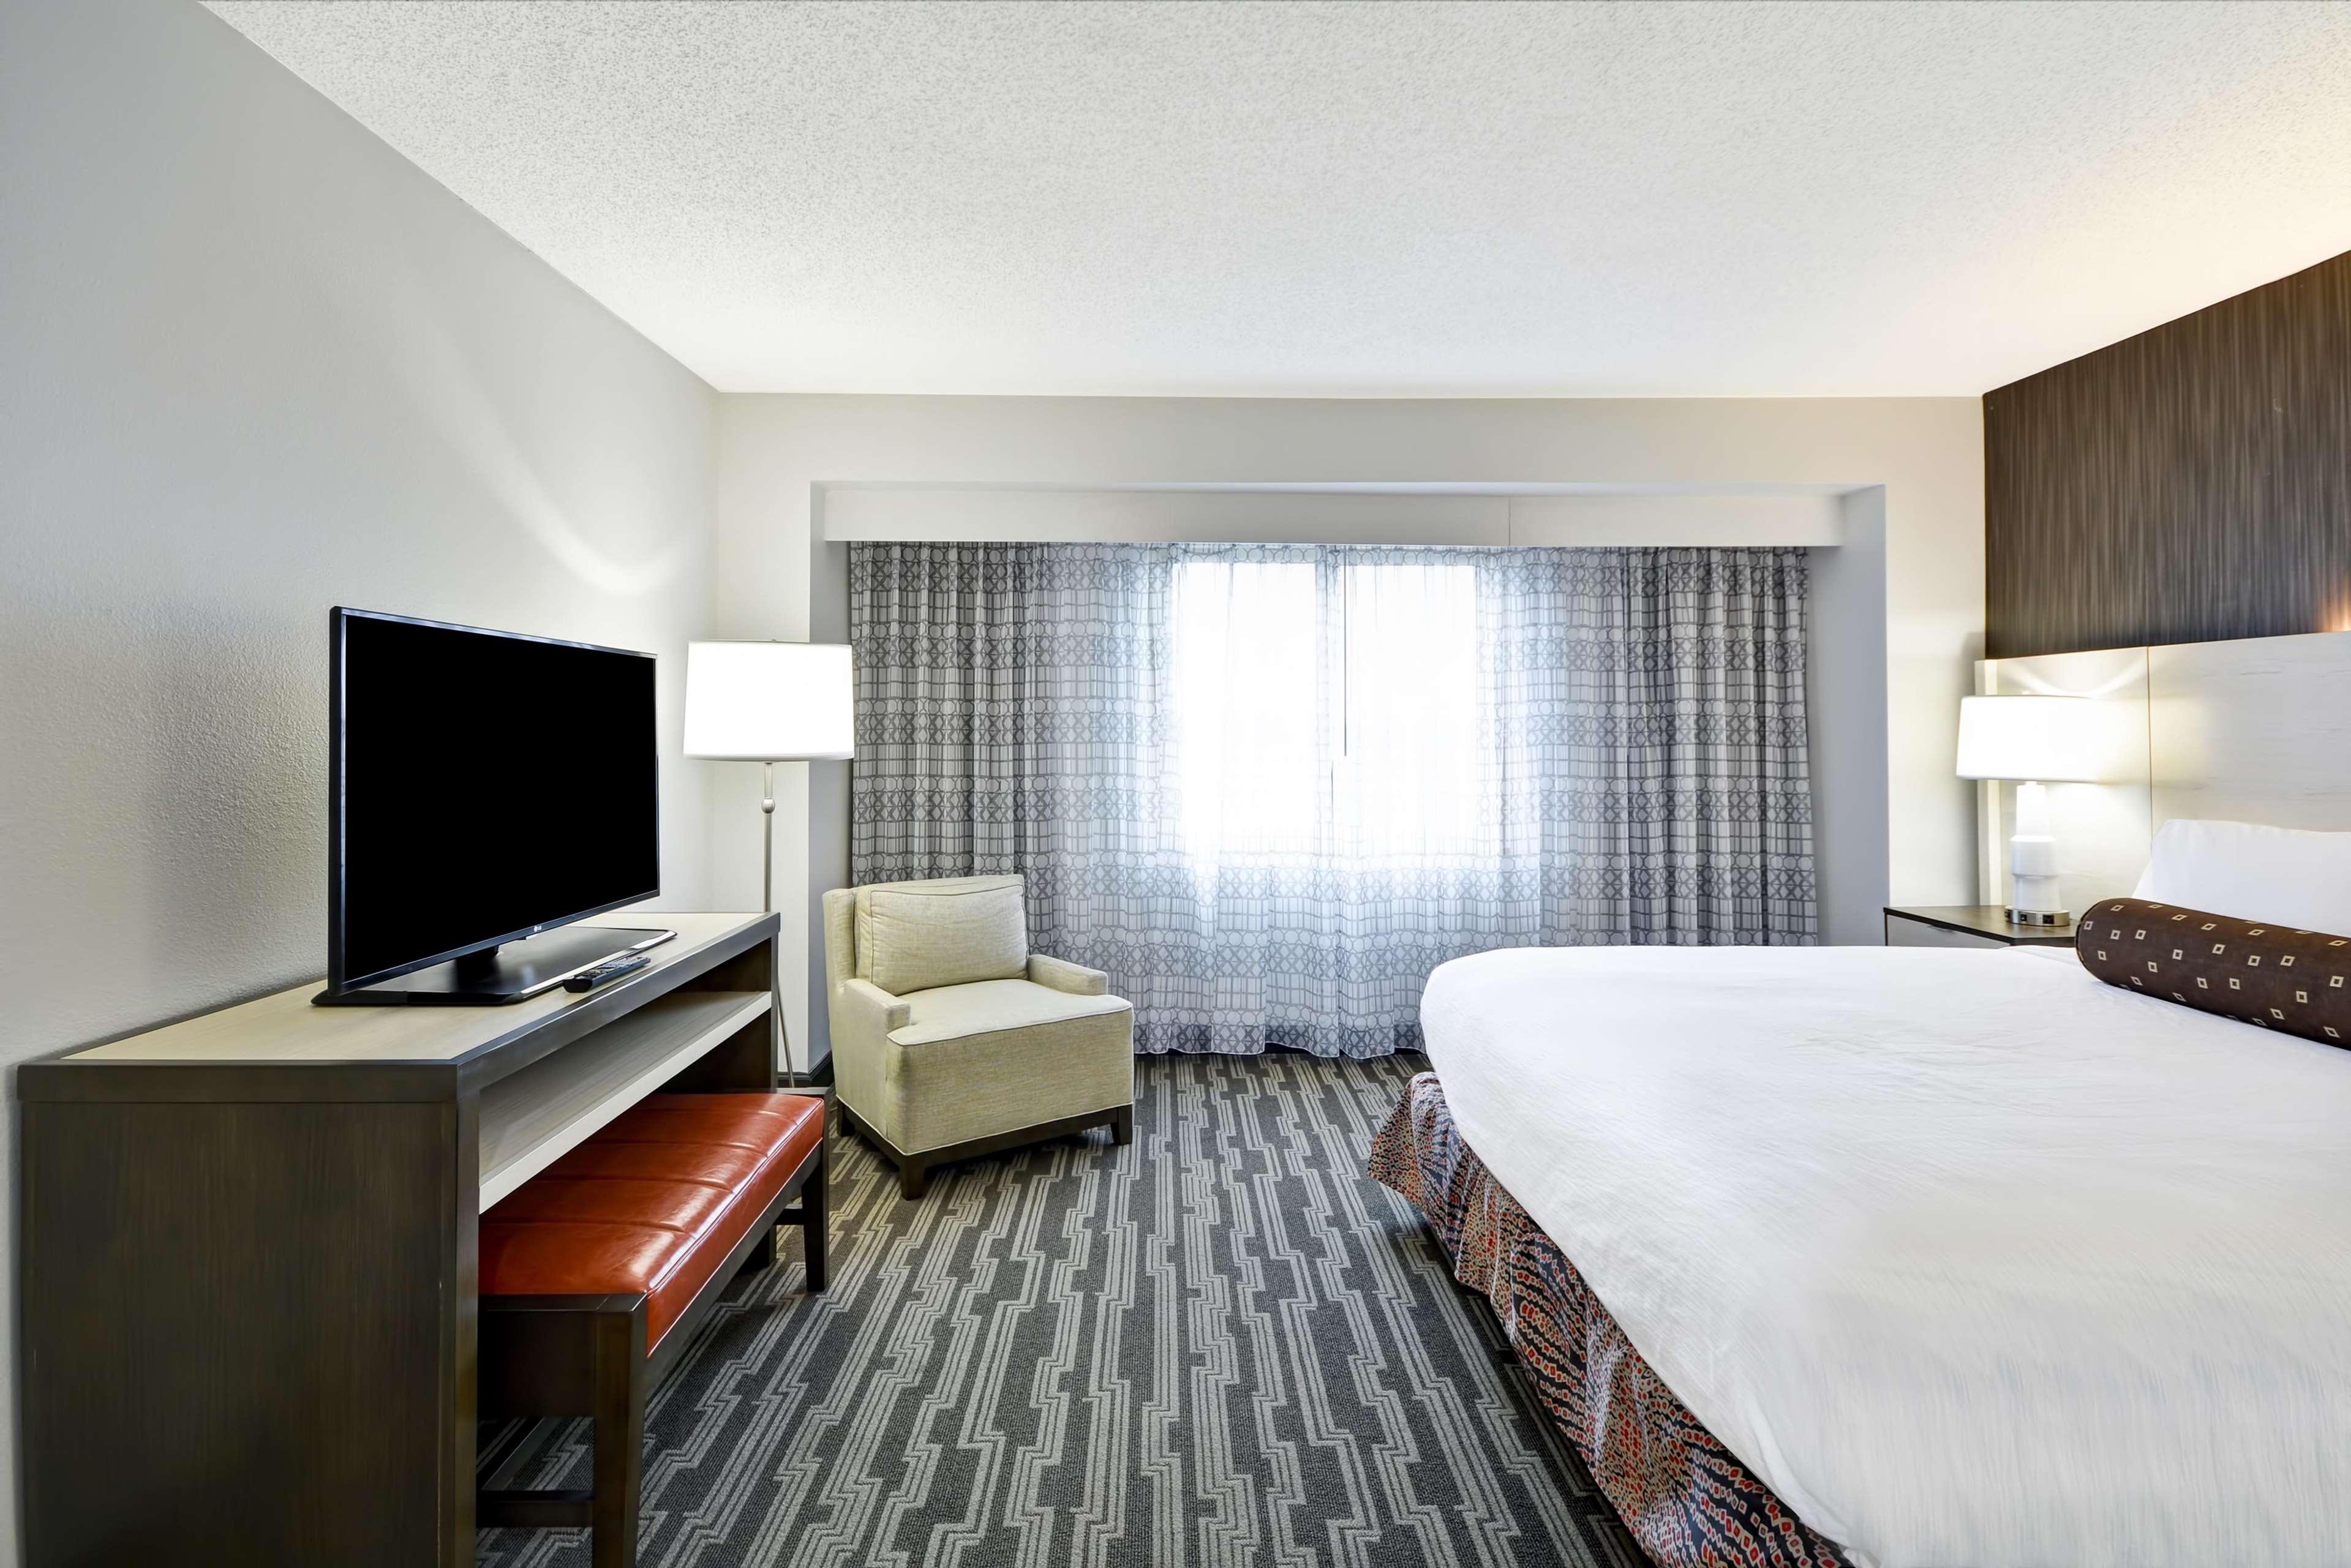 2 Bedroom Suites In Charlotte Nc Near Carowinds